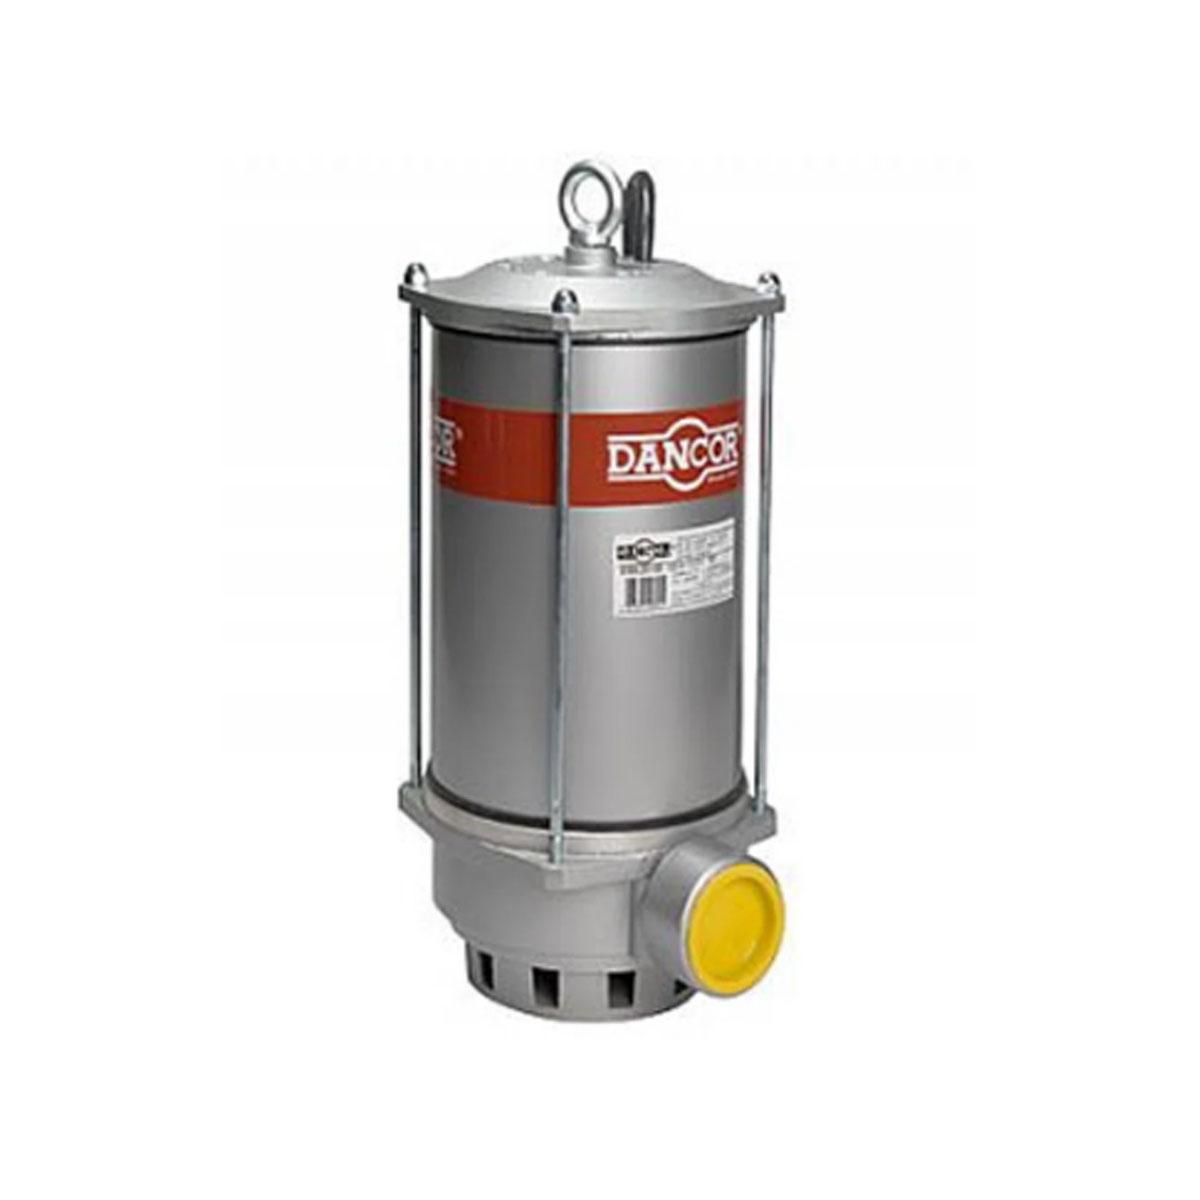 Bomba Submersível SDE 2303 3 CV 220V Trifásica IR3 Dancor